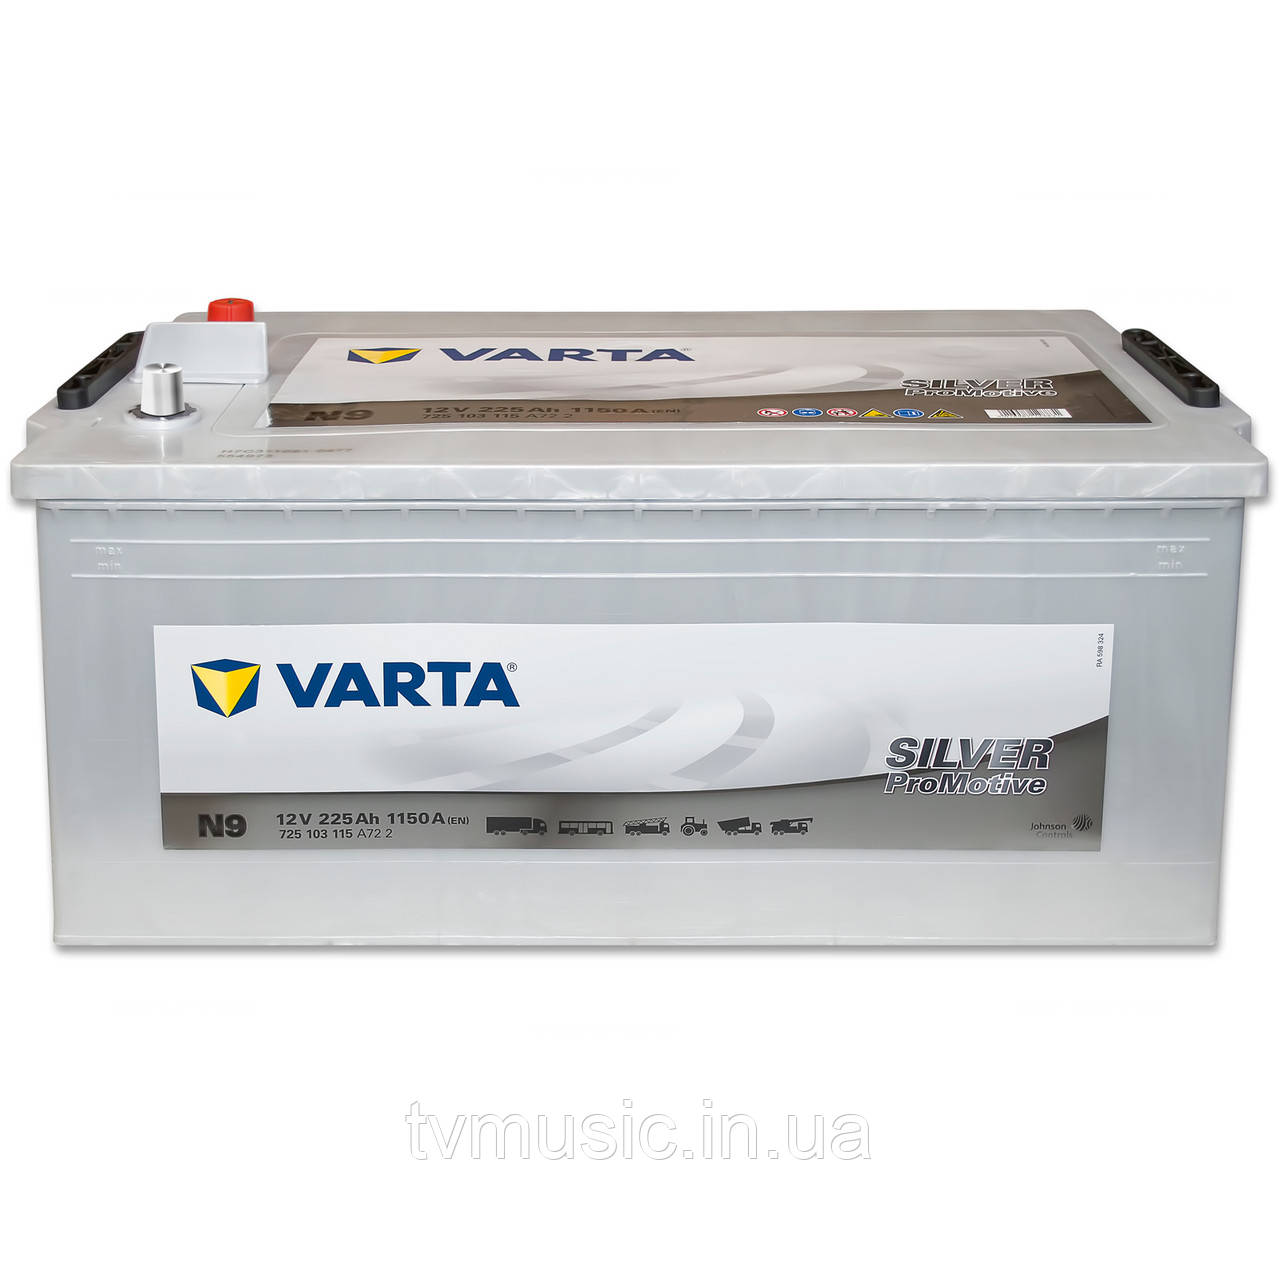 Грузовой аккумулятор Varta Promotive Silver N9 225Ah 12V (725 103 115)